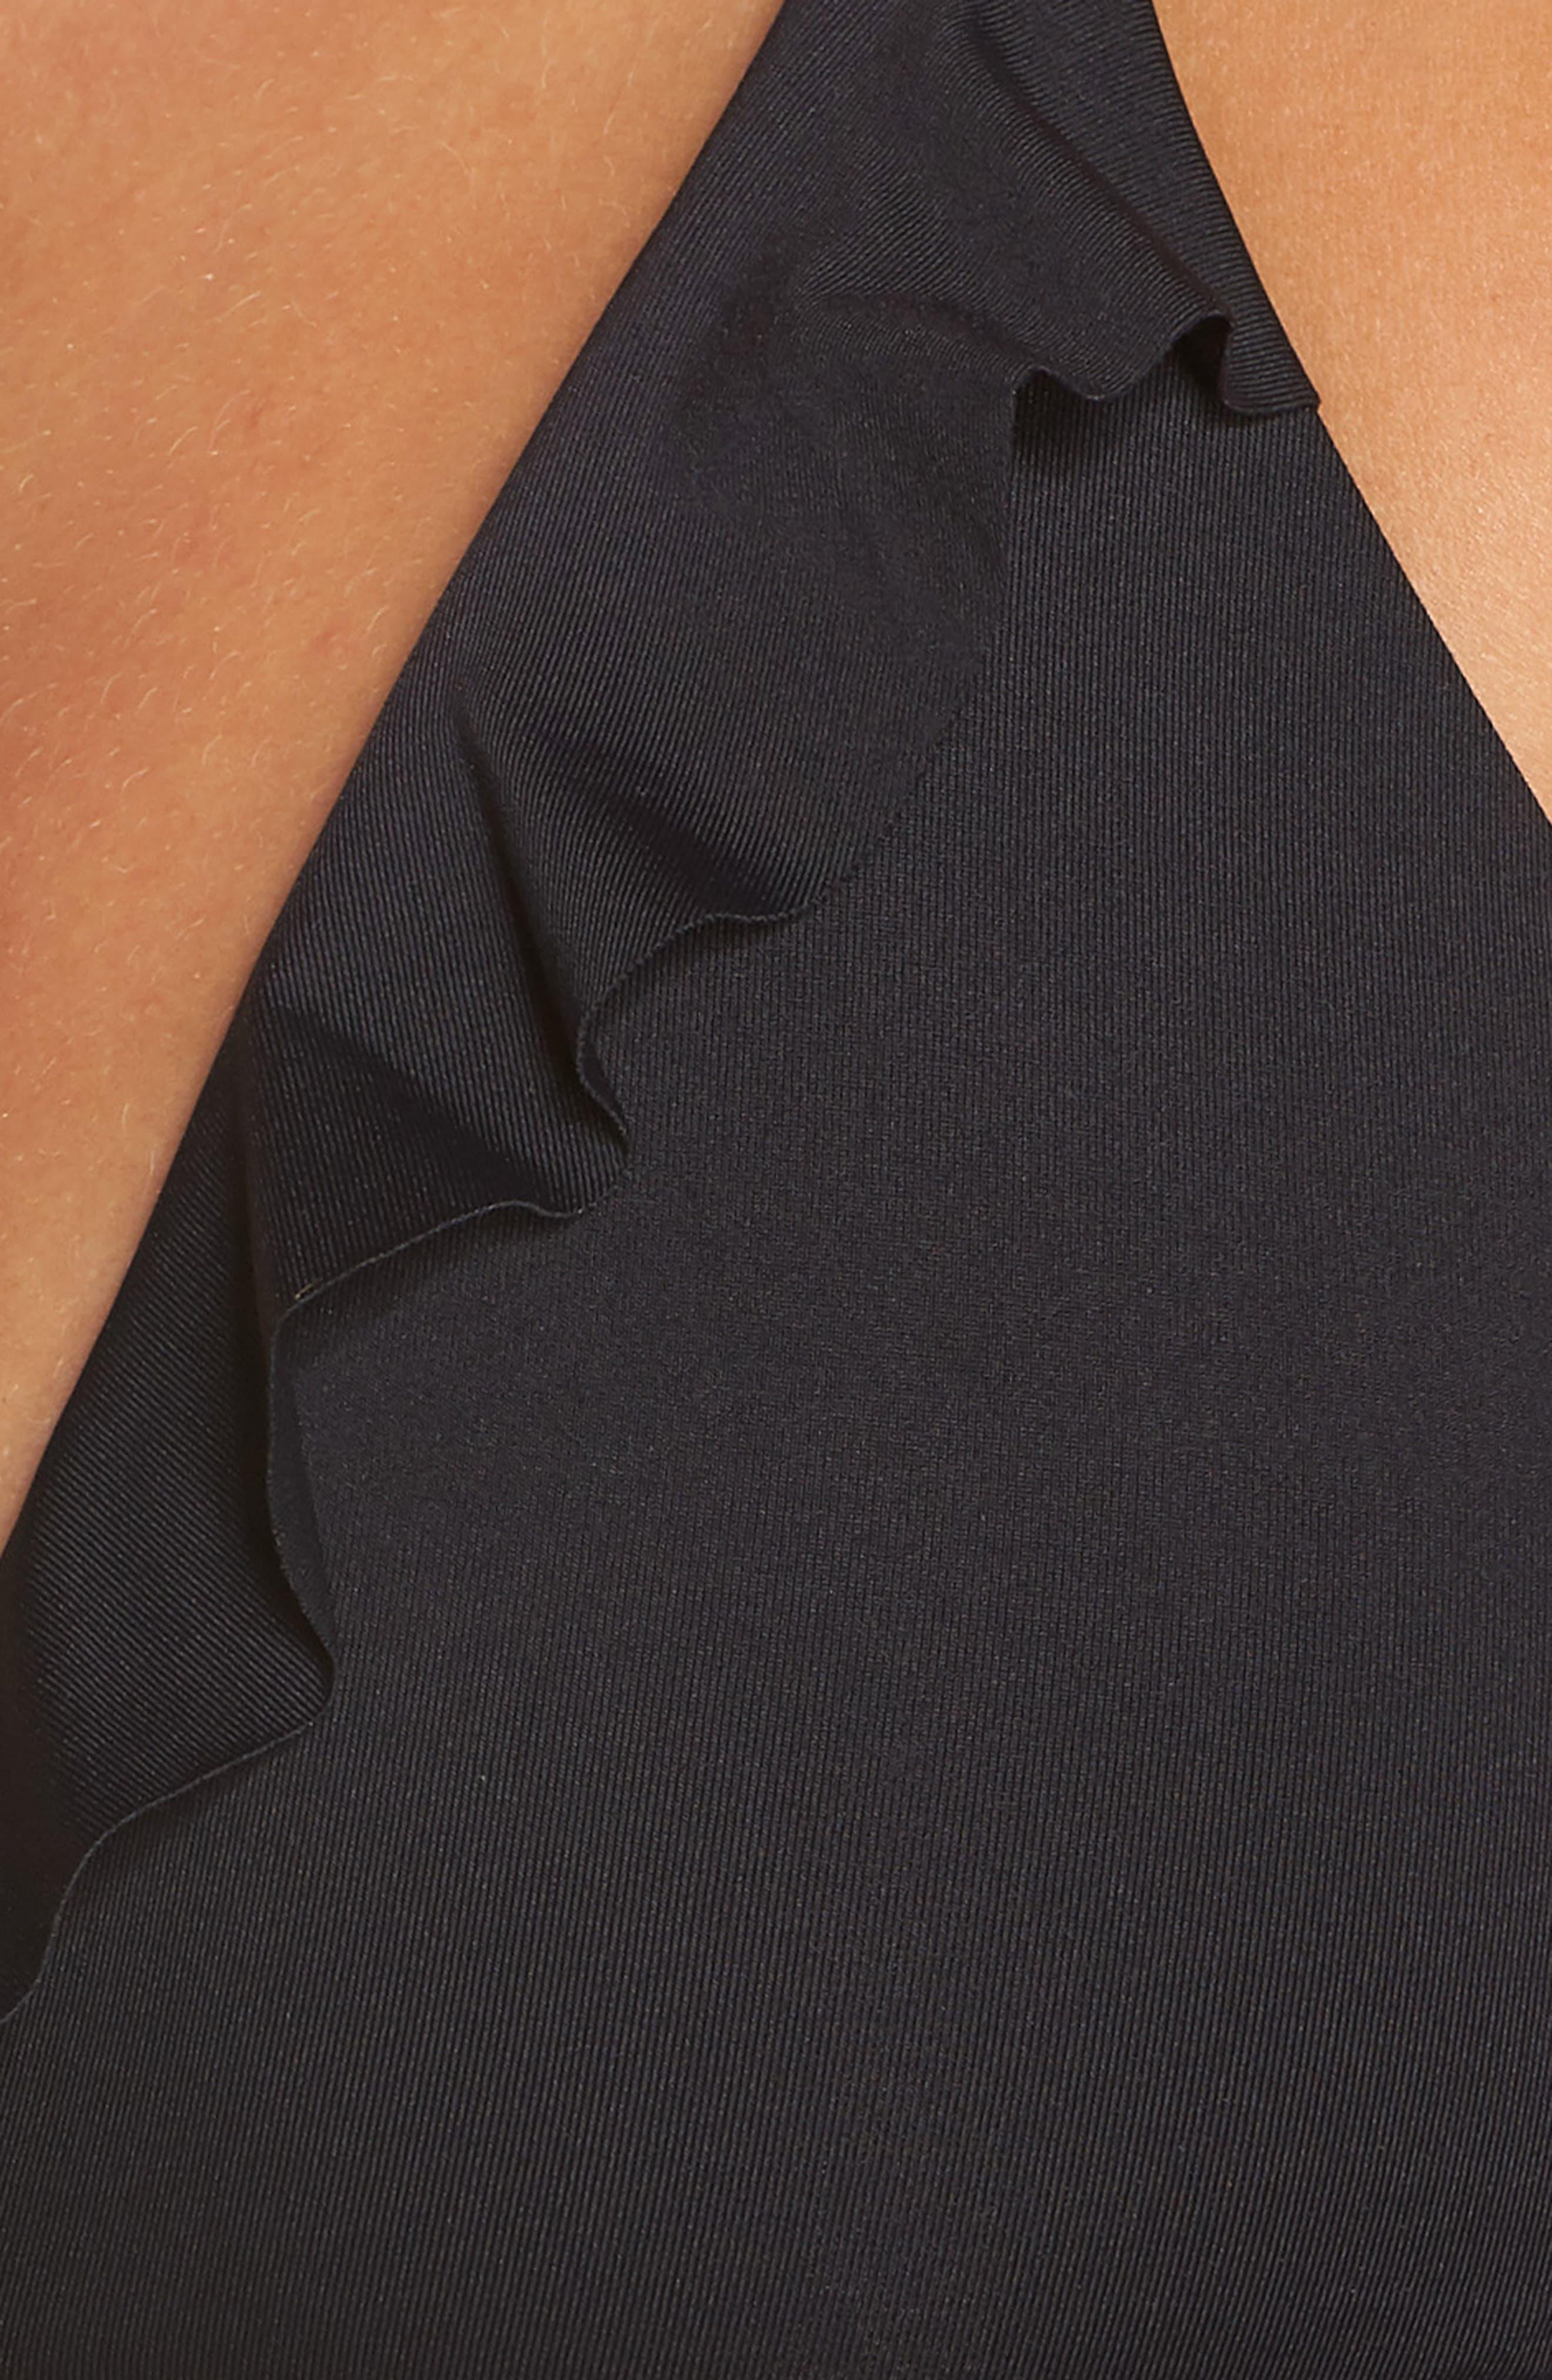 BECCA, Socialite Ruffle Bikini Top, Alternate thumbnail 6, color, BLACK